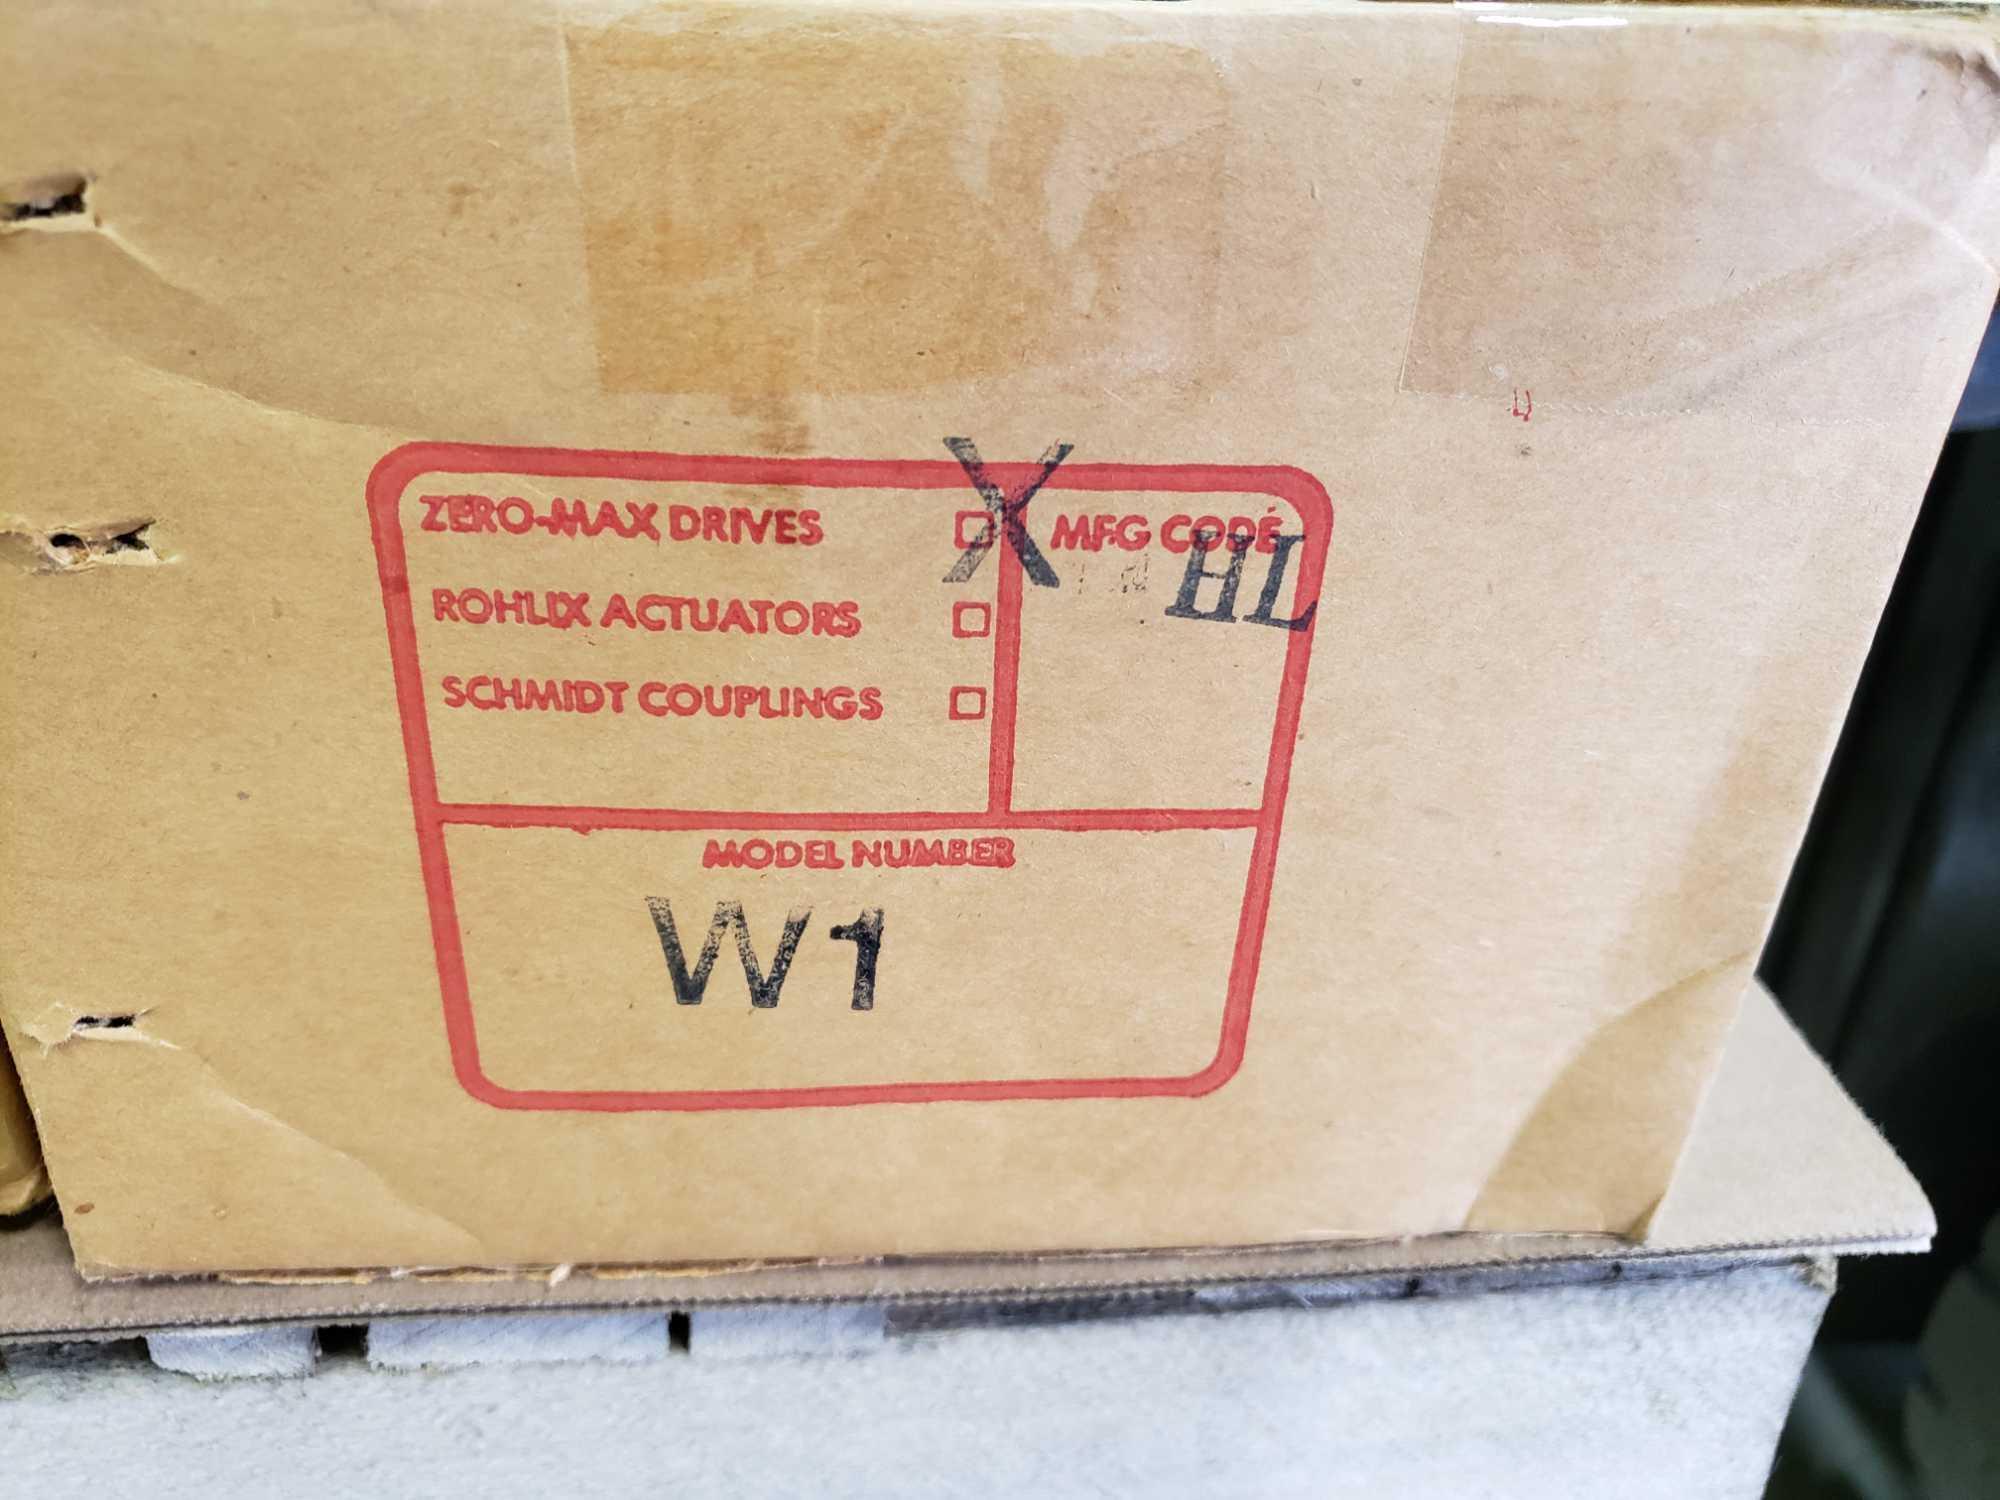 Zero-max gearhead power block model W1 speed range 0-100, gear ratio 4:1. New in box. - Image 3 of 3